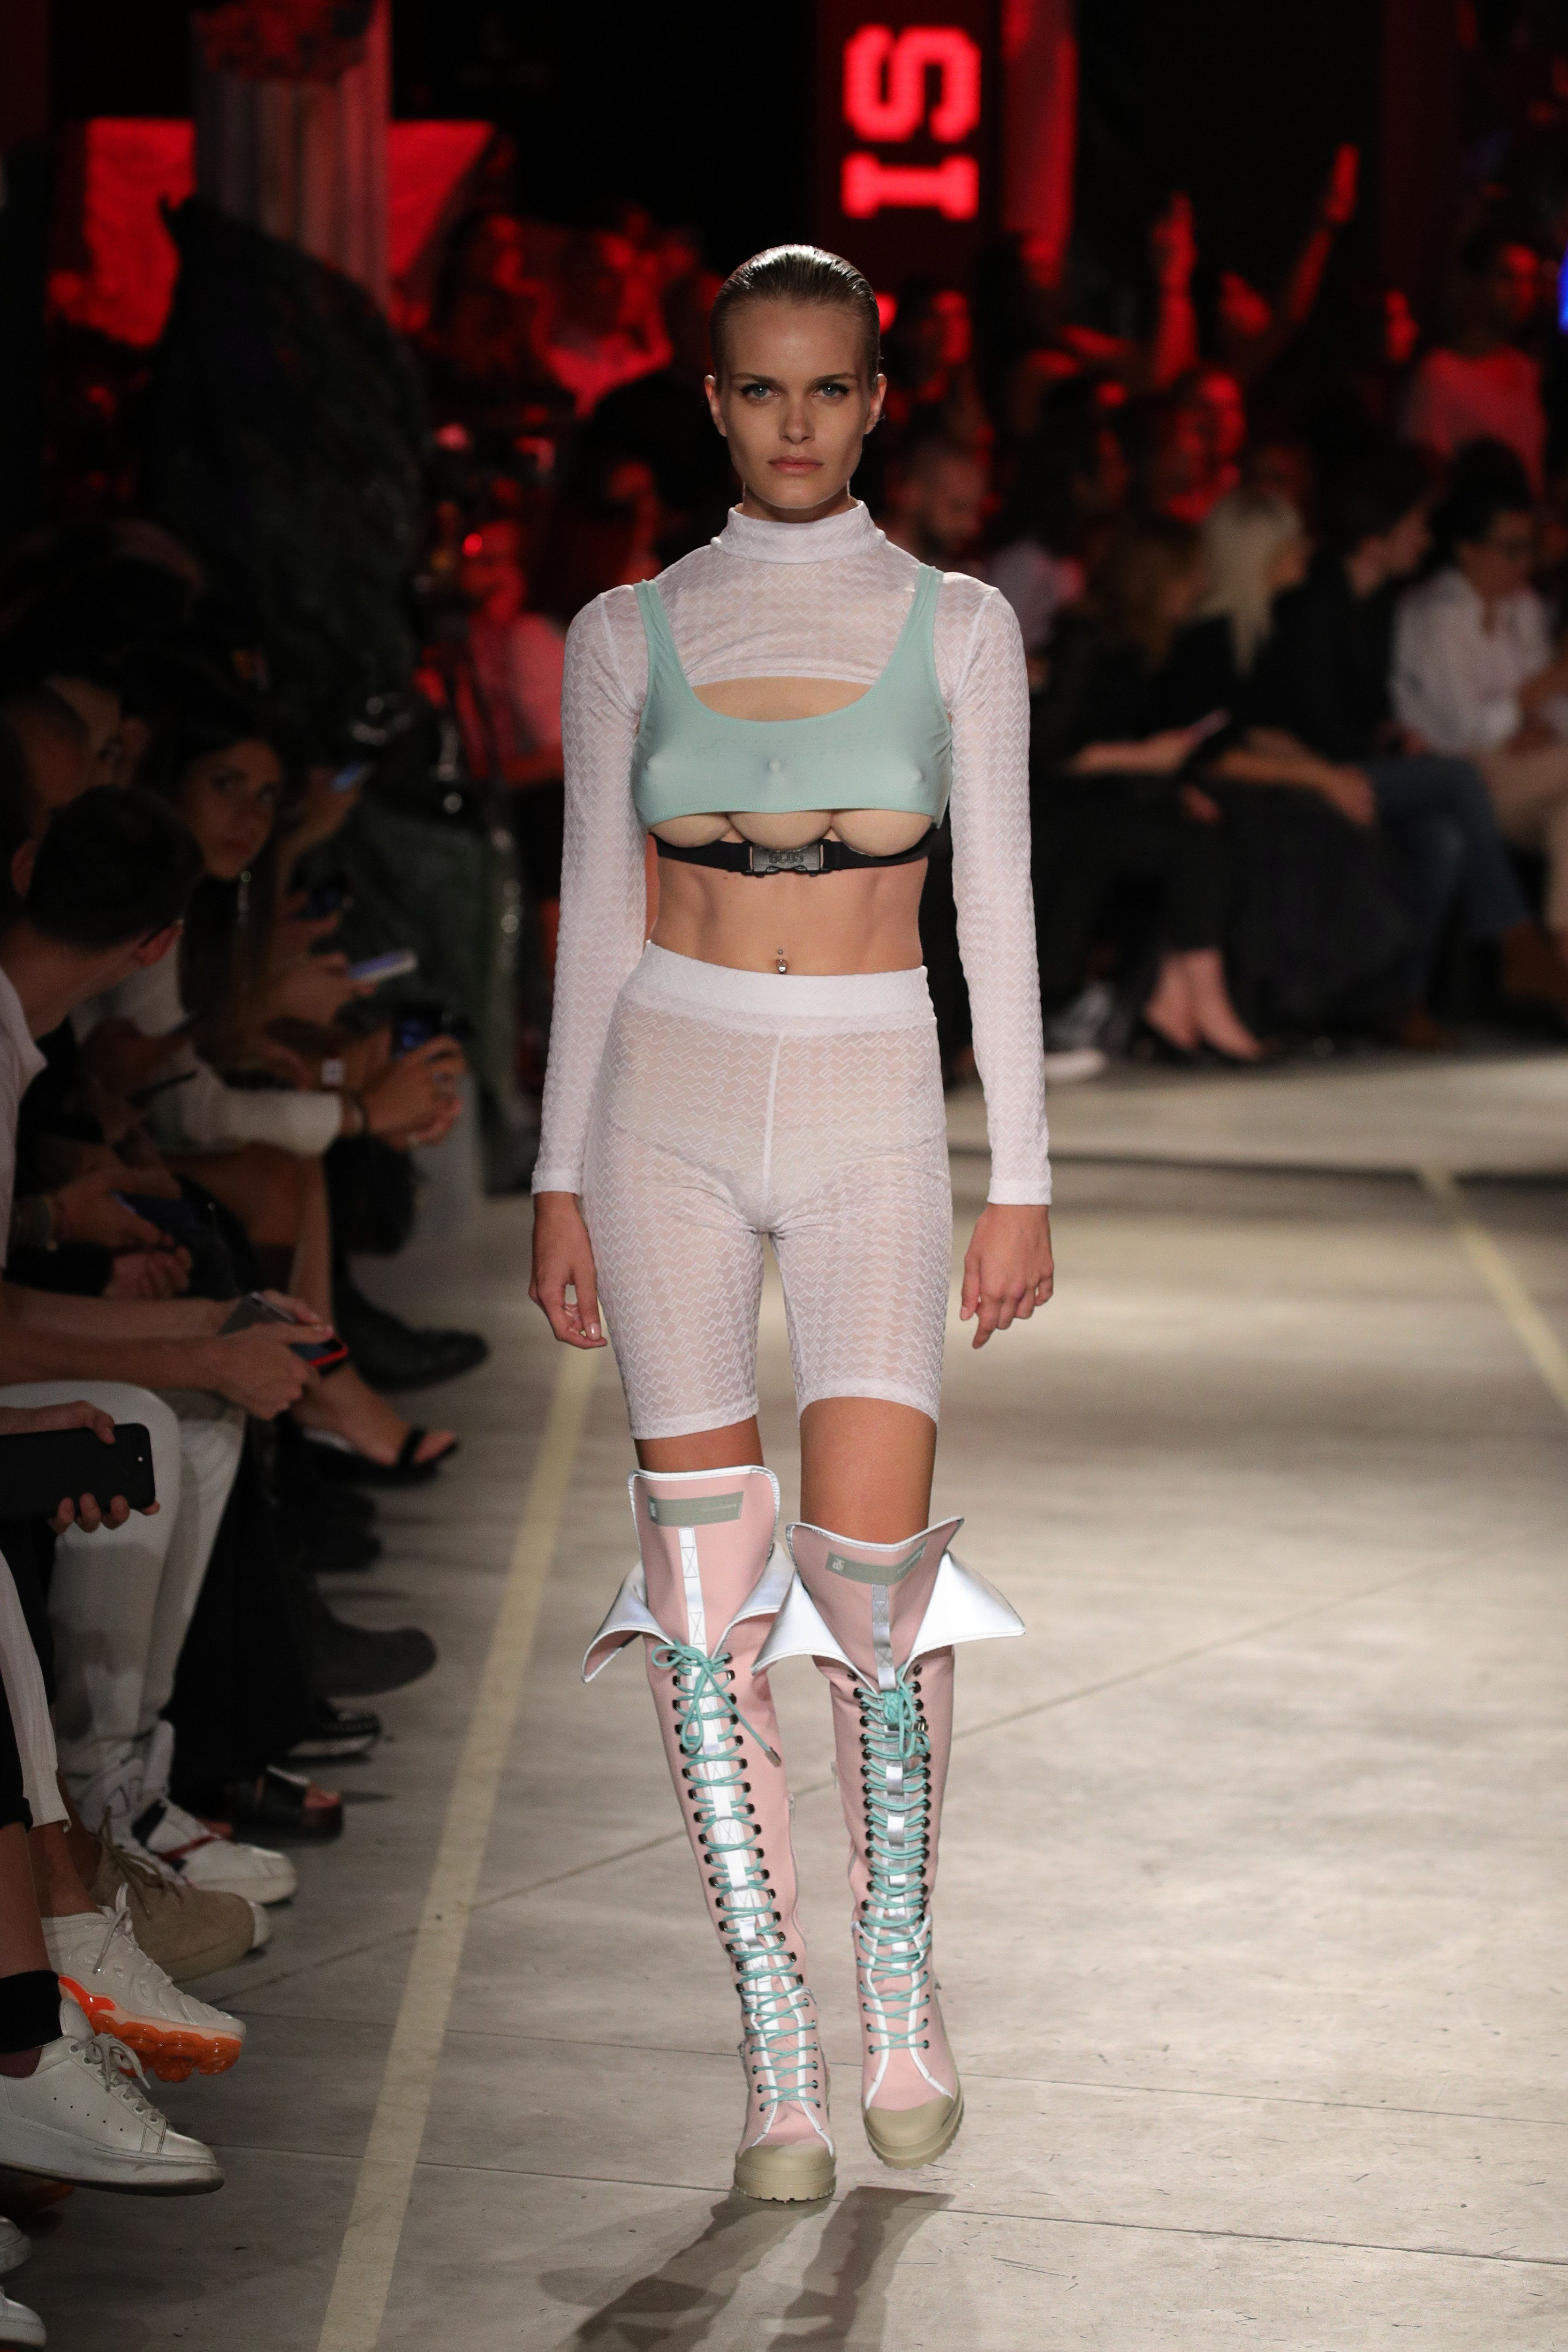 Boob fashion image